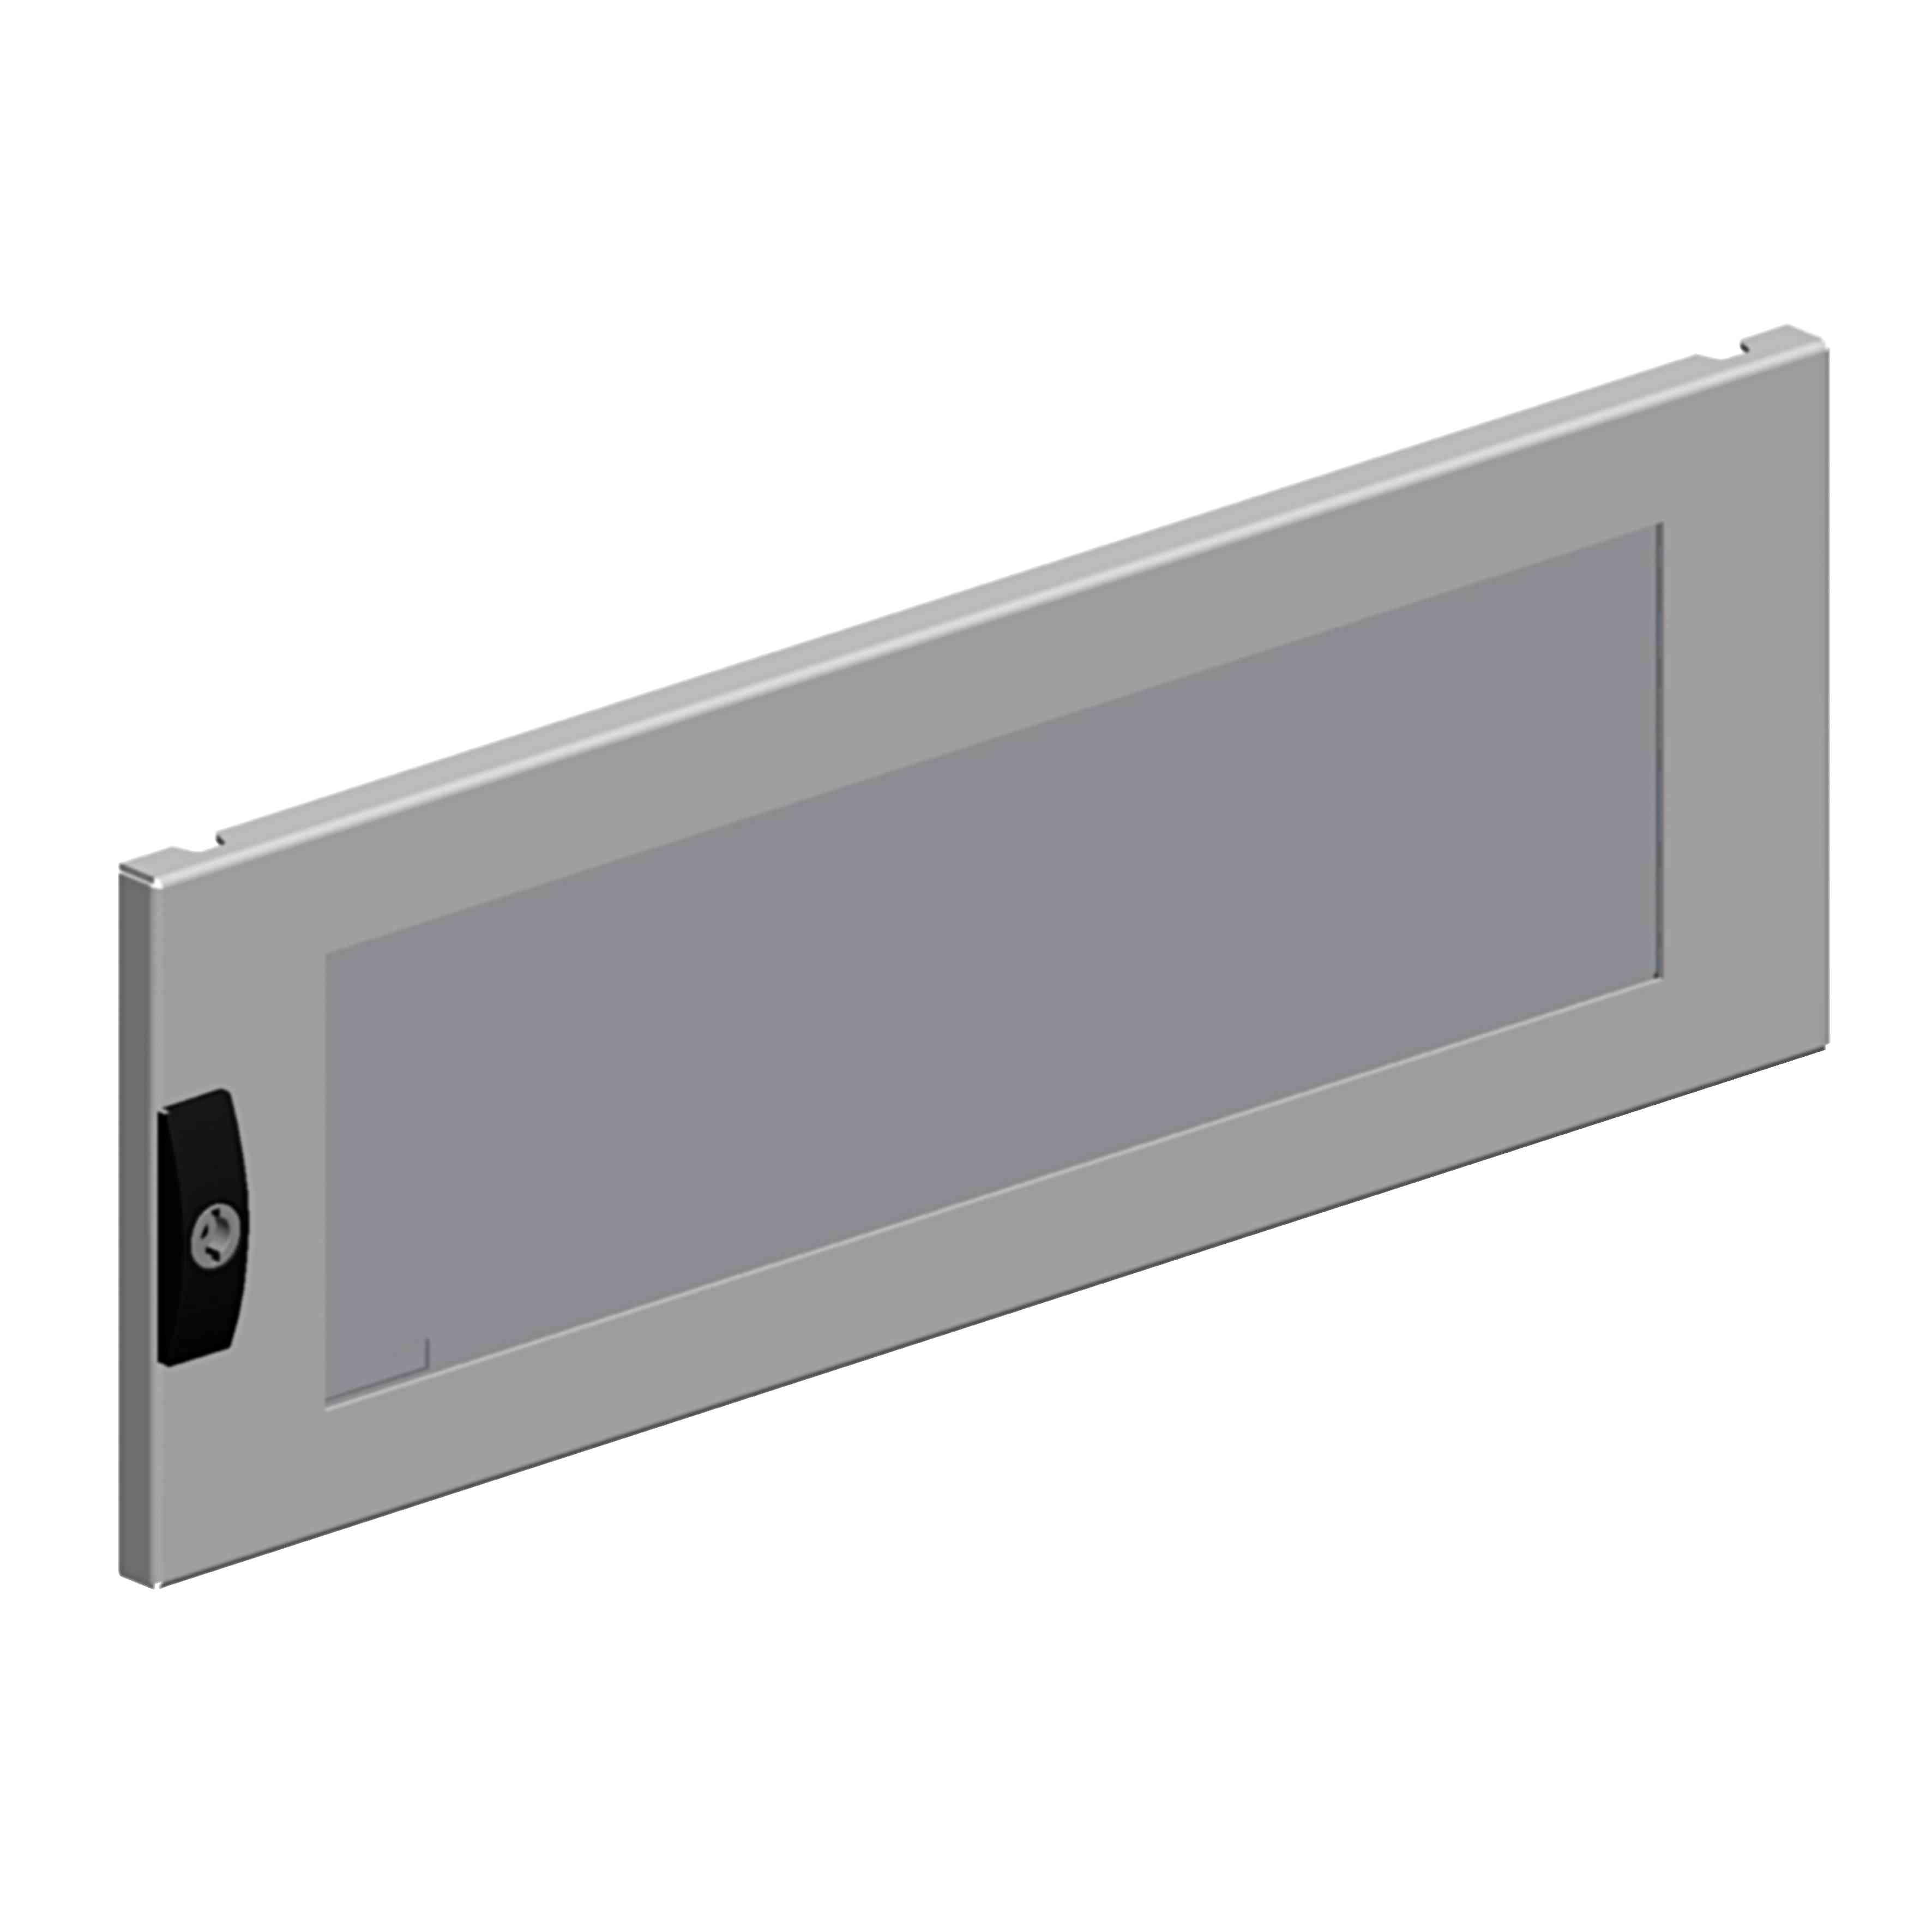 Spacial SF prosojna vrata - 400 x 800 mm